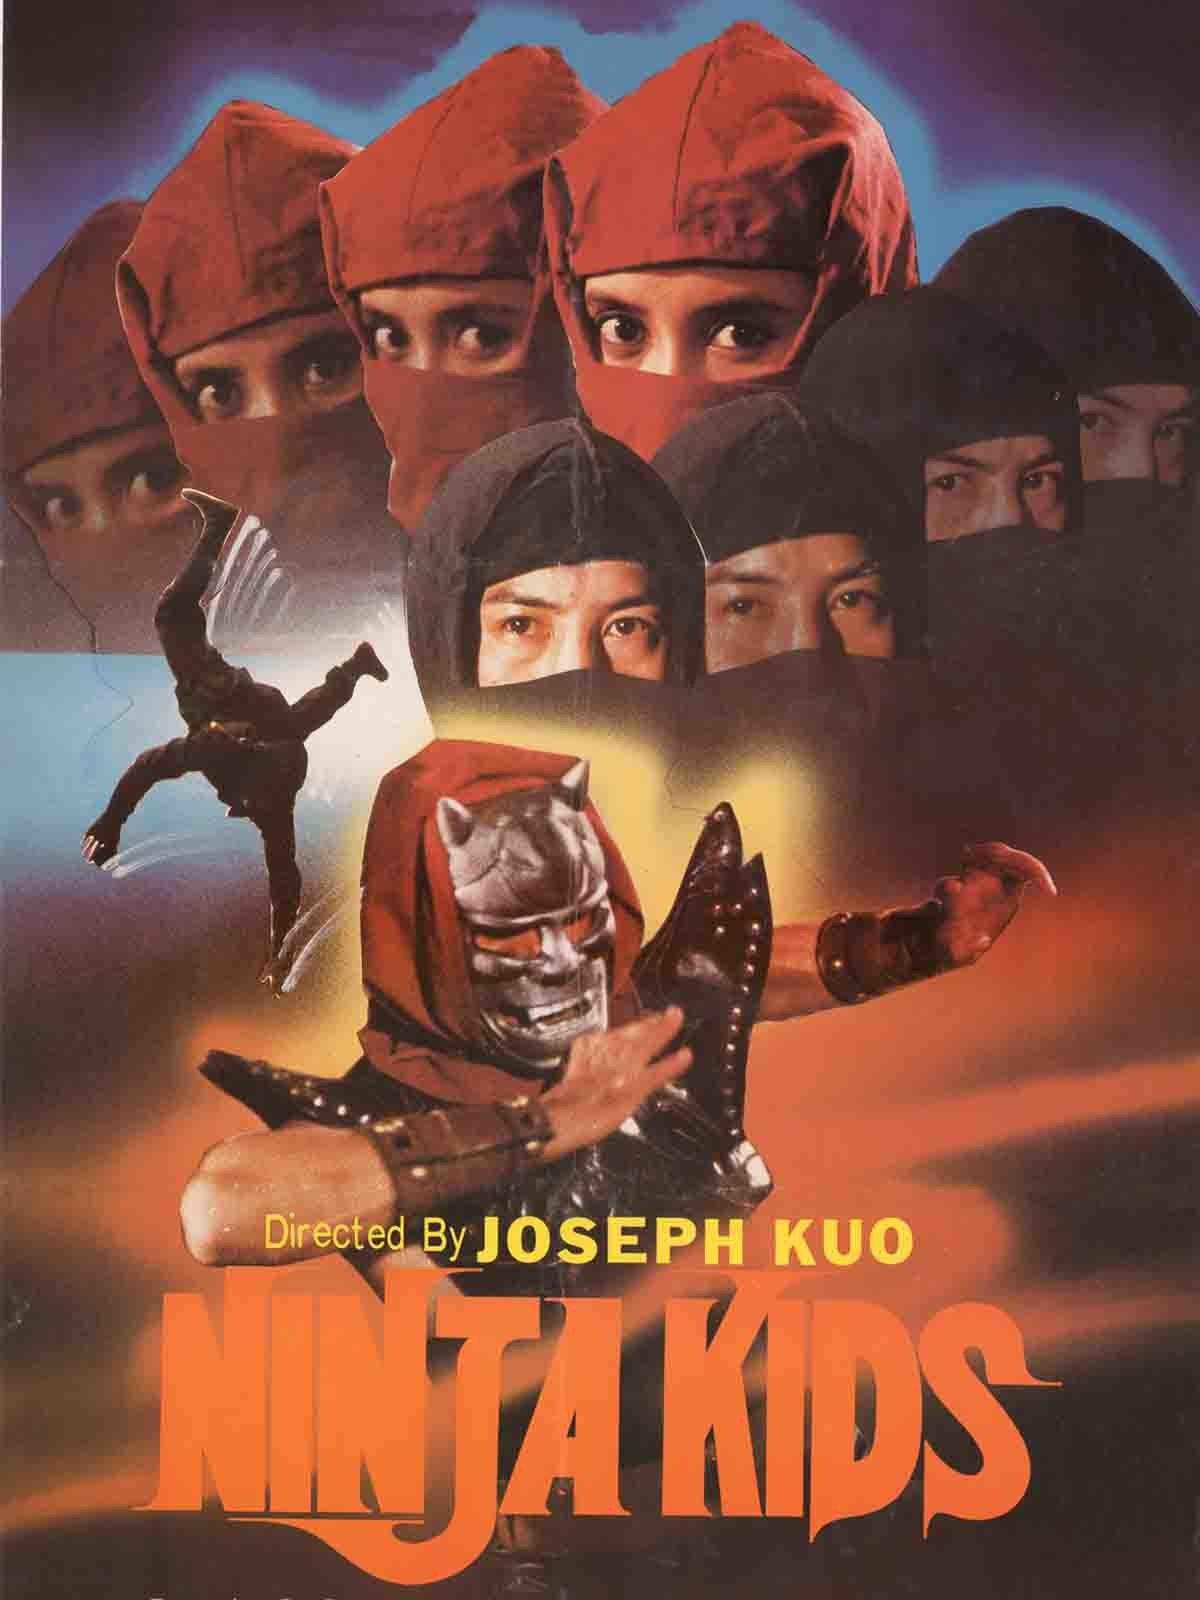 Watch Ninja Kids | Prime Video